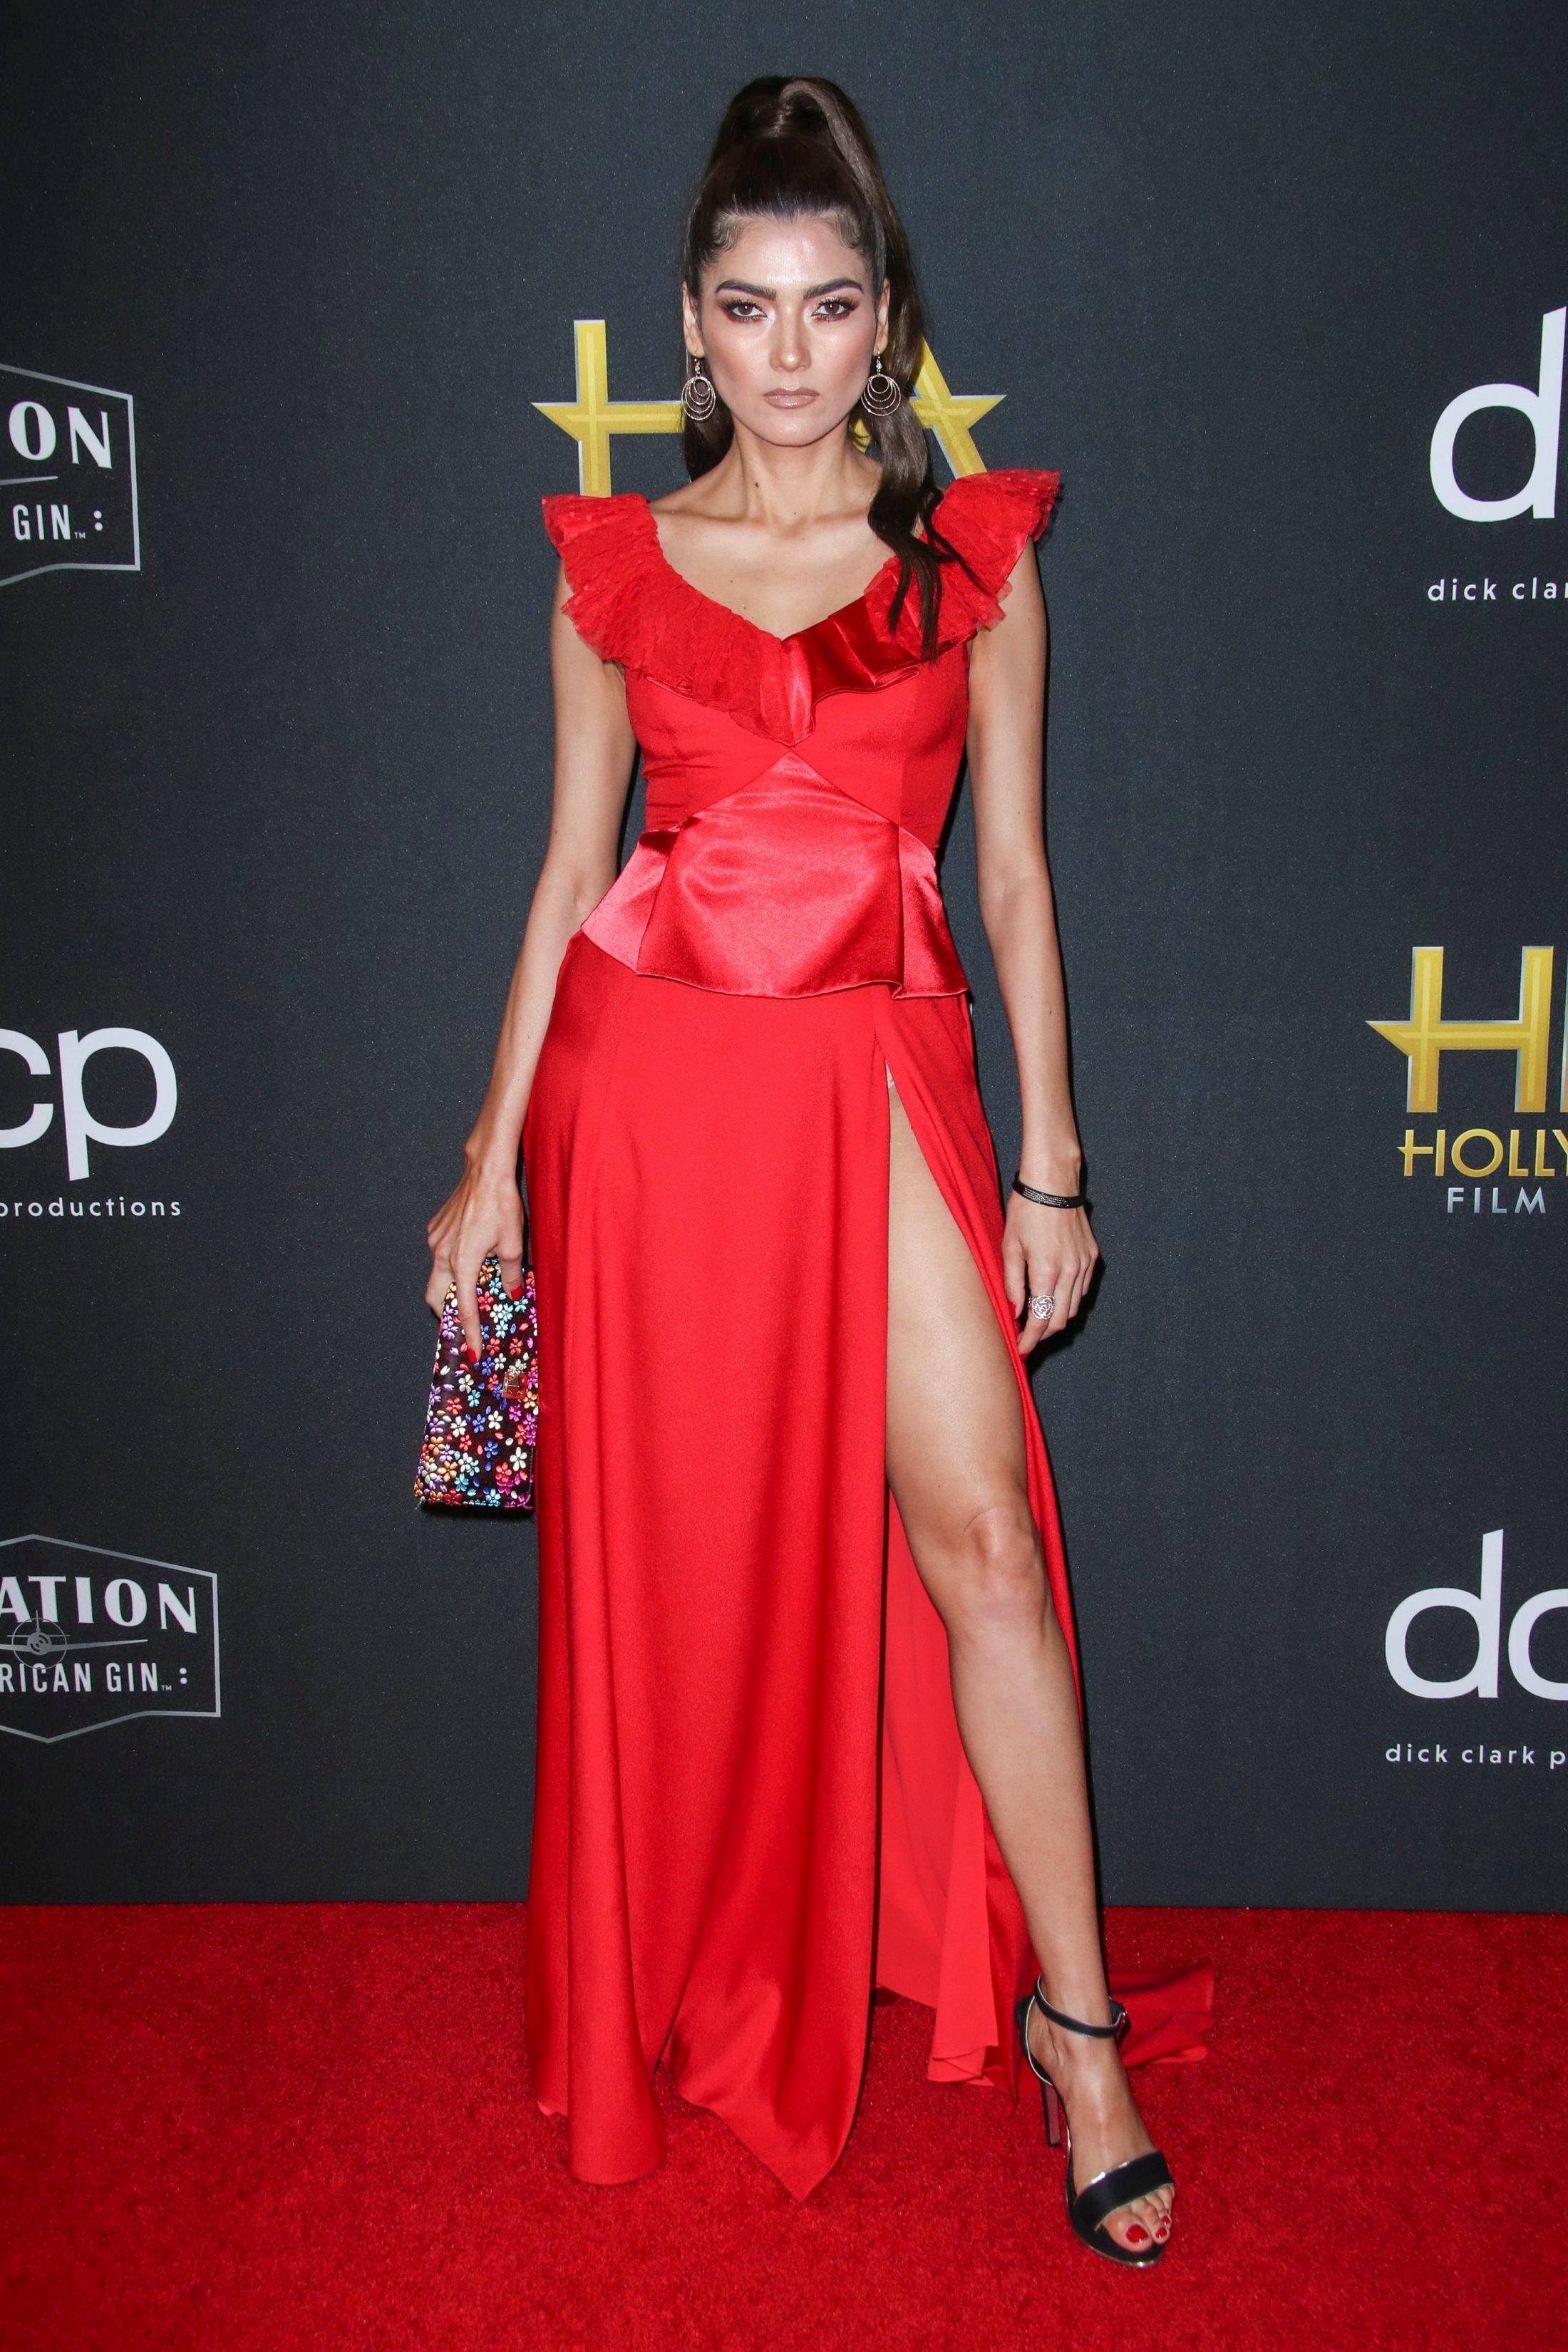 Blanca Blanco 2019 : 23rd Annual Hollywood Film Awards, Arrivals, Beverly Hilton, Los Angeles, USA – 03 Nov 2019